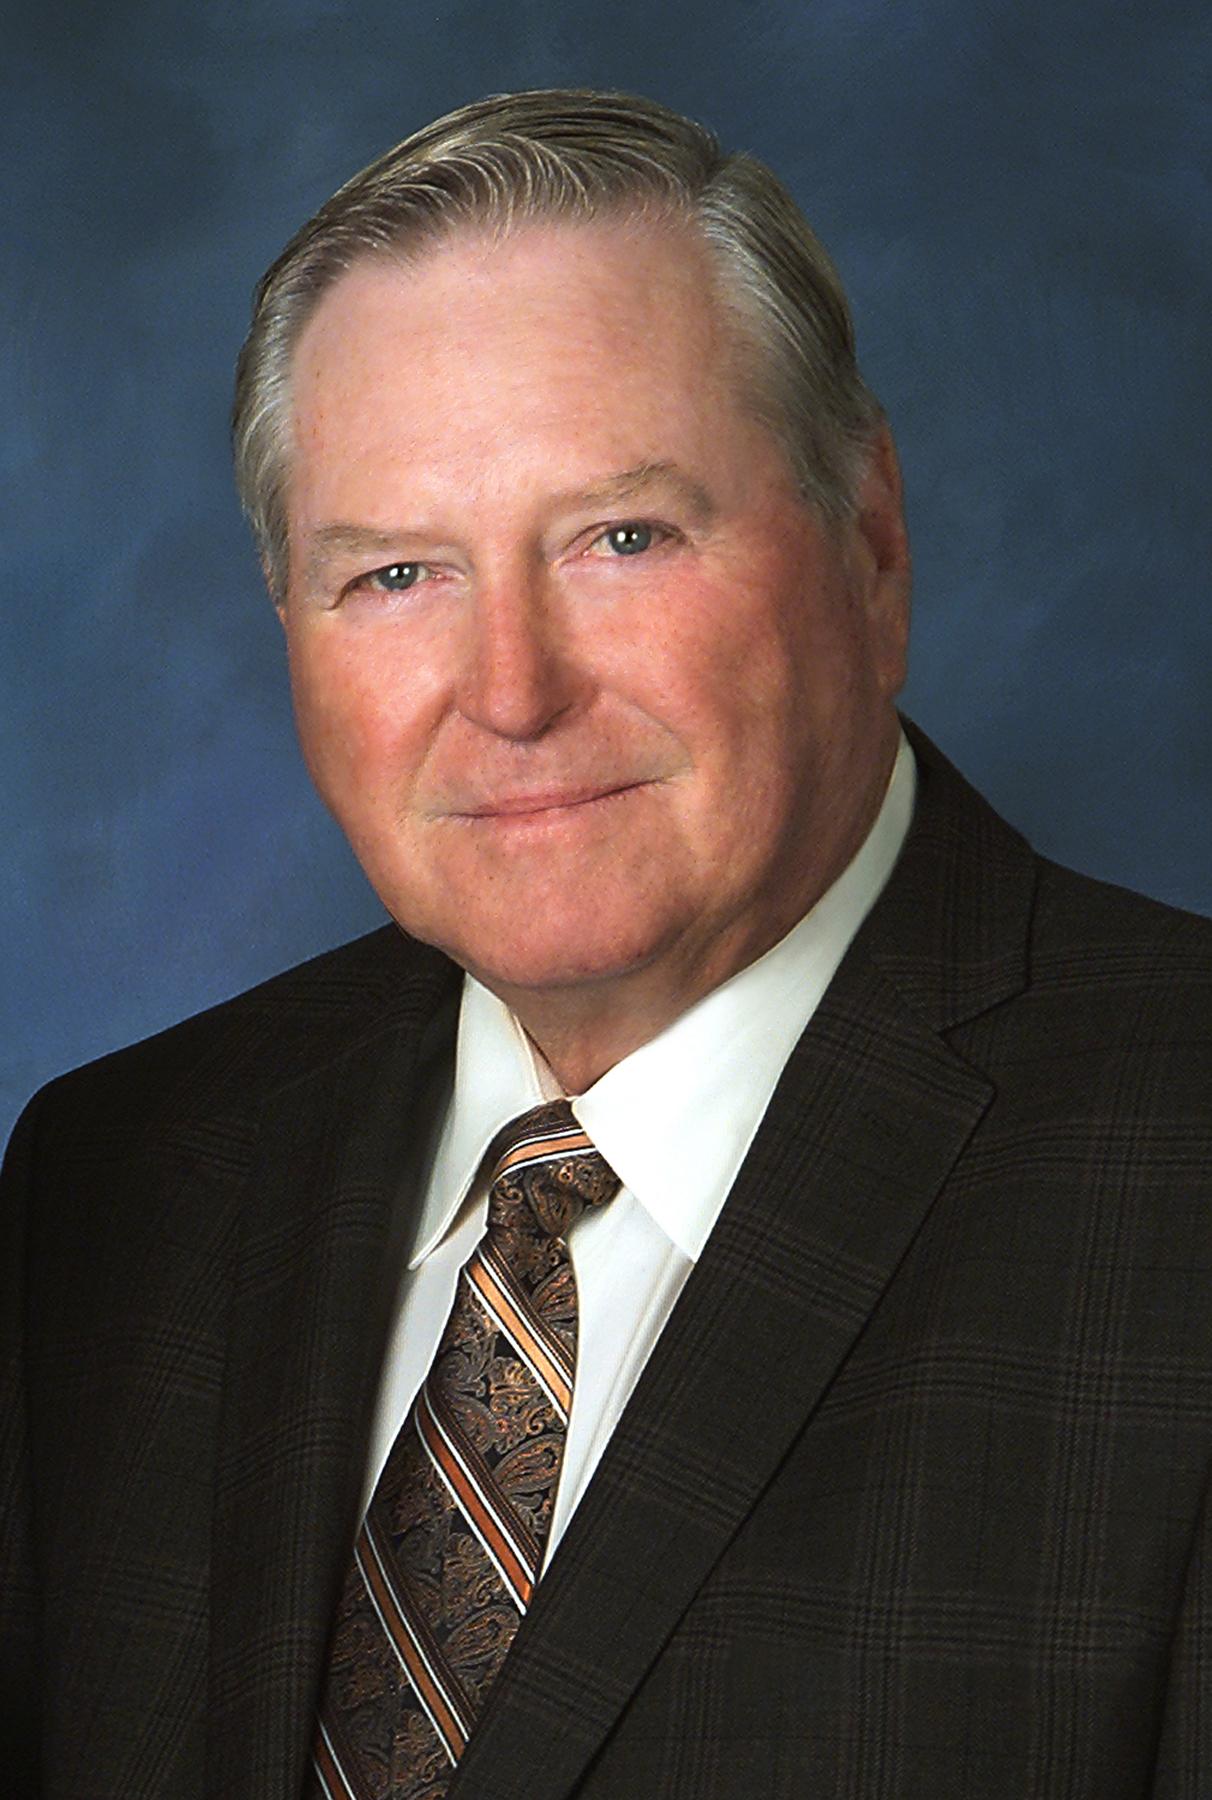 Nova Southeastern University Names Richard Davis to Lead Regional Campuses and Online Education